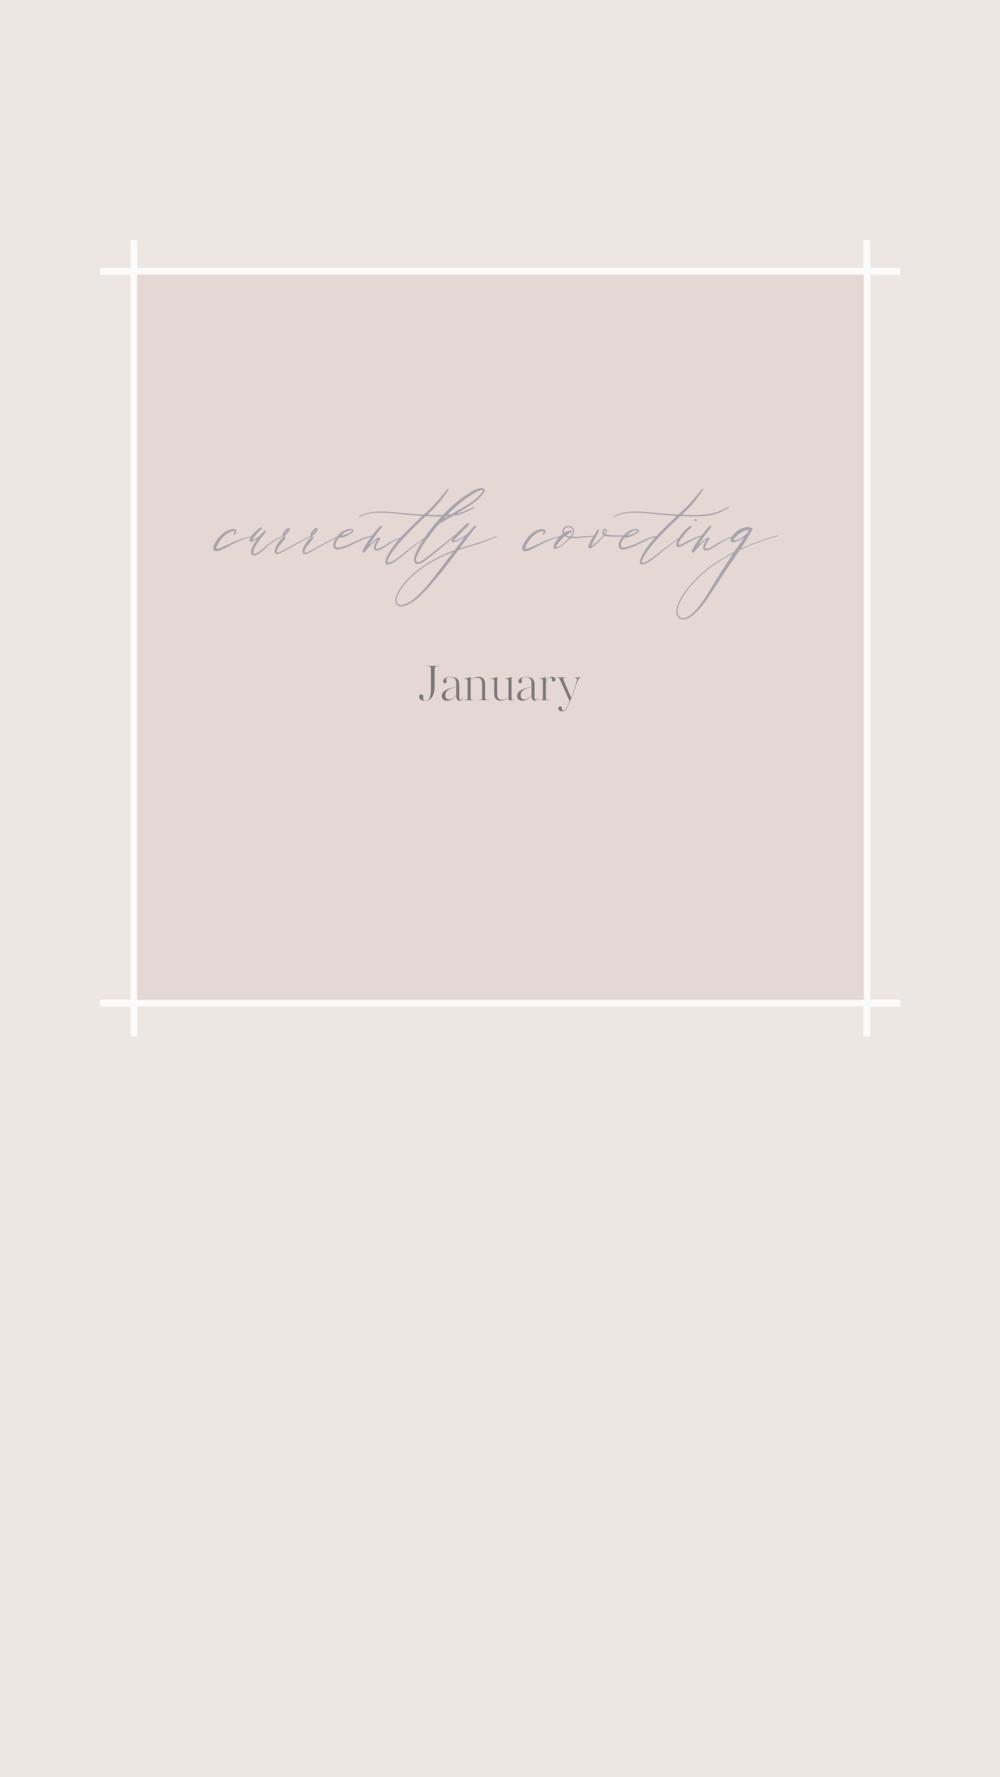 CC January.png